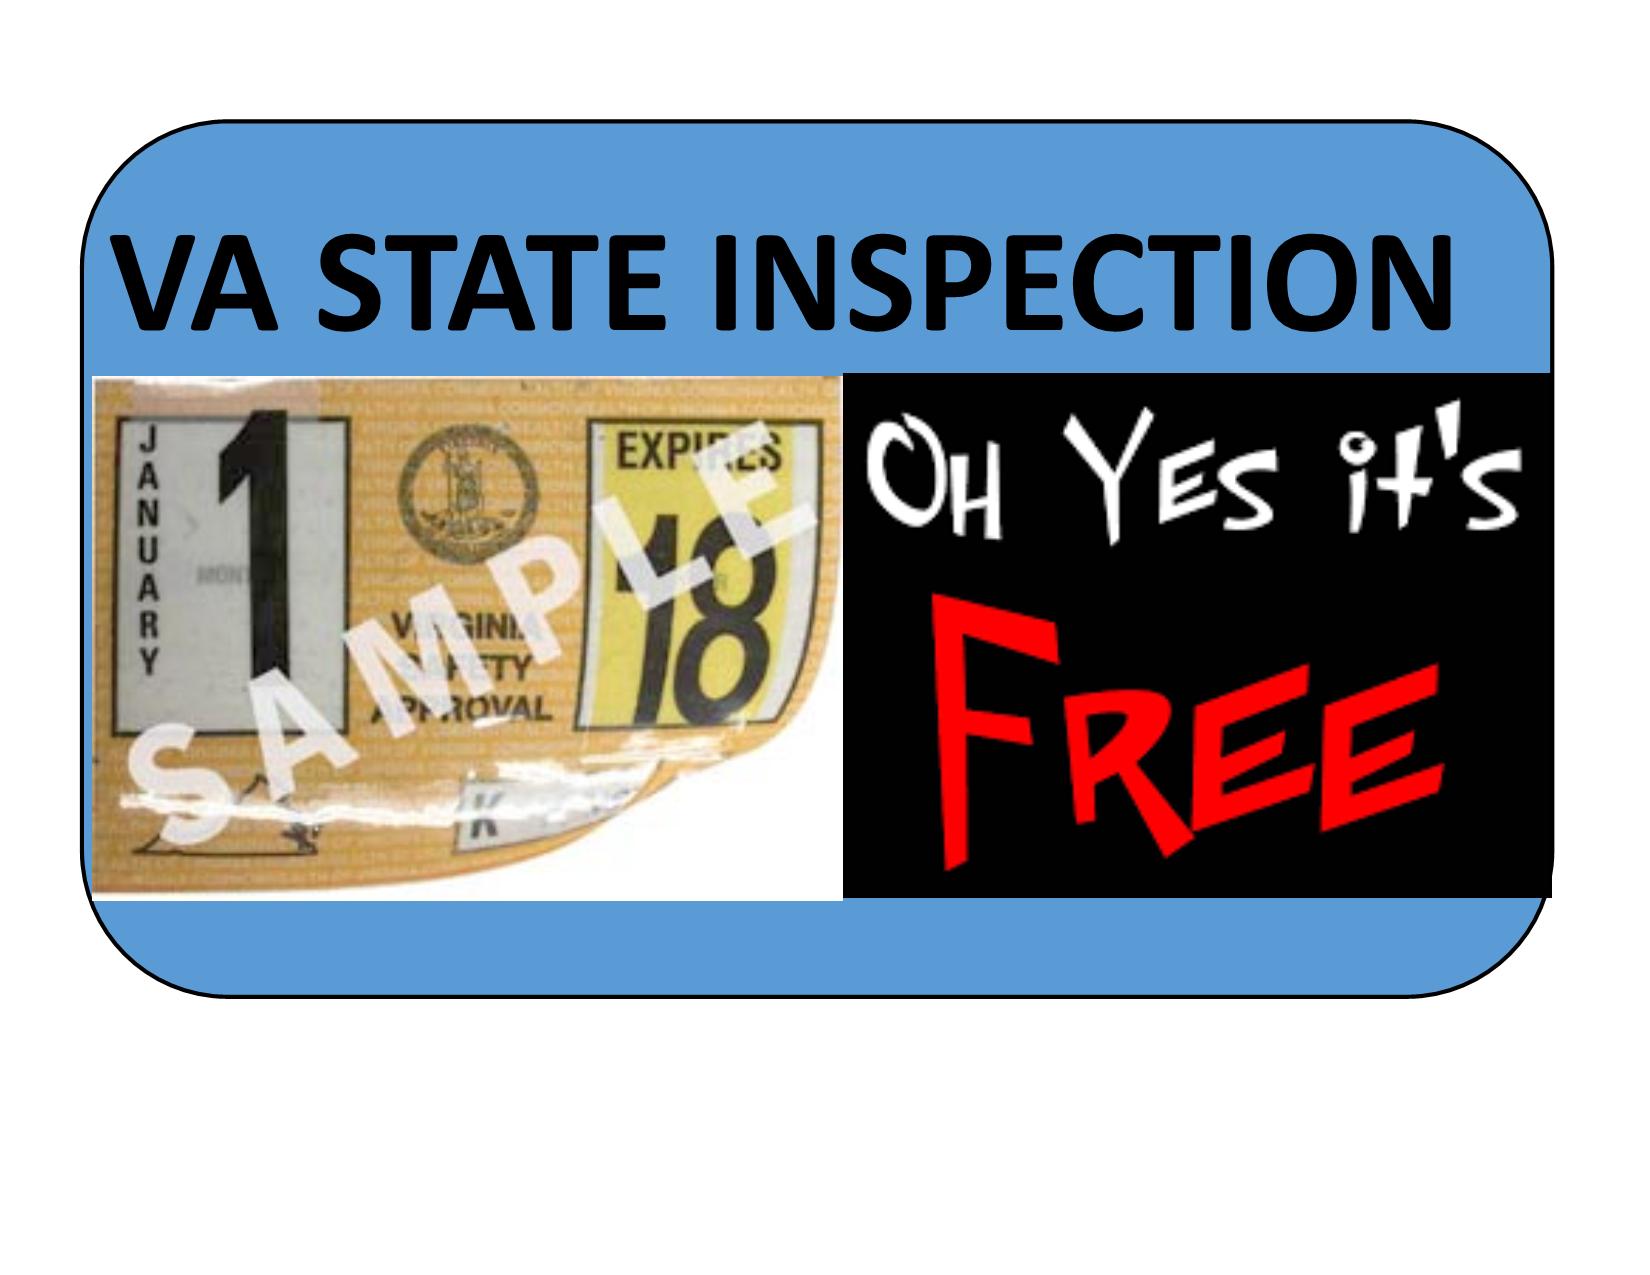 VA State Inspection